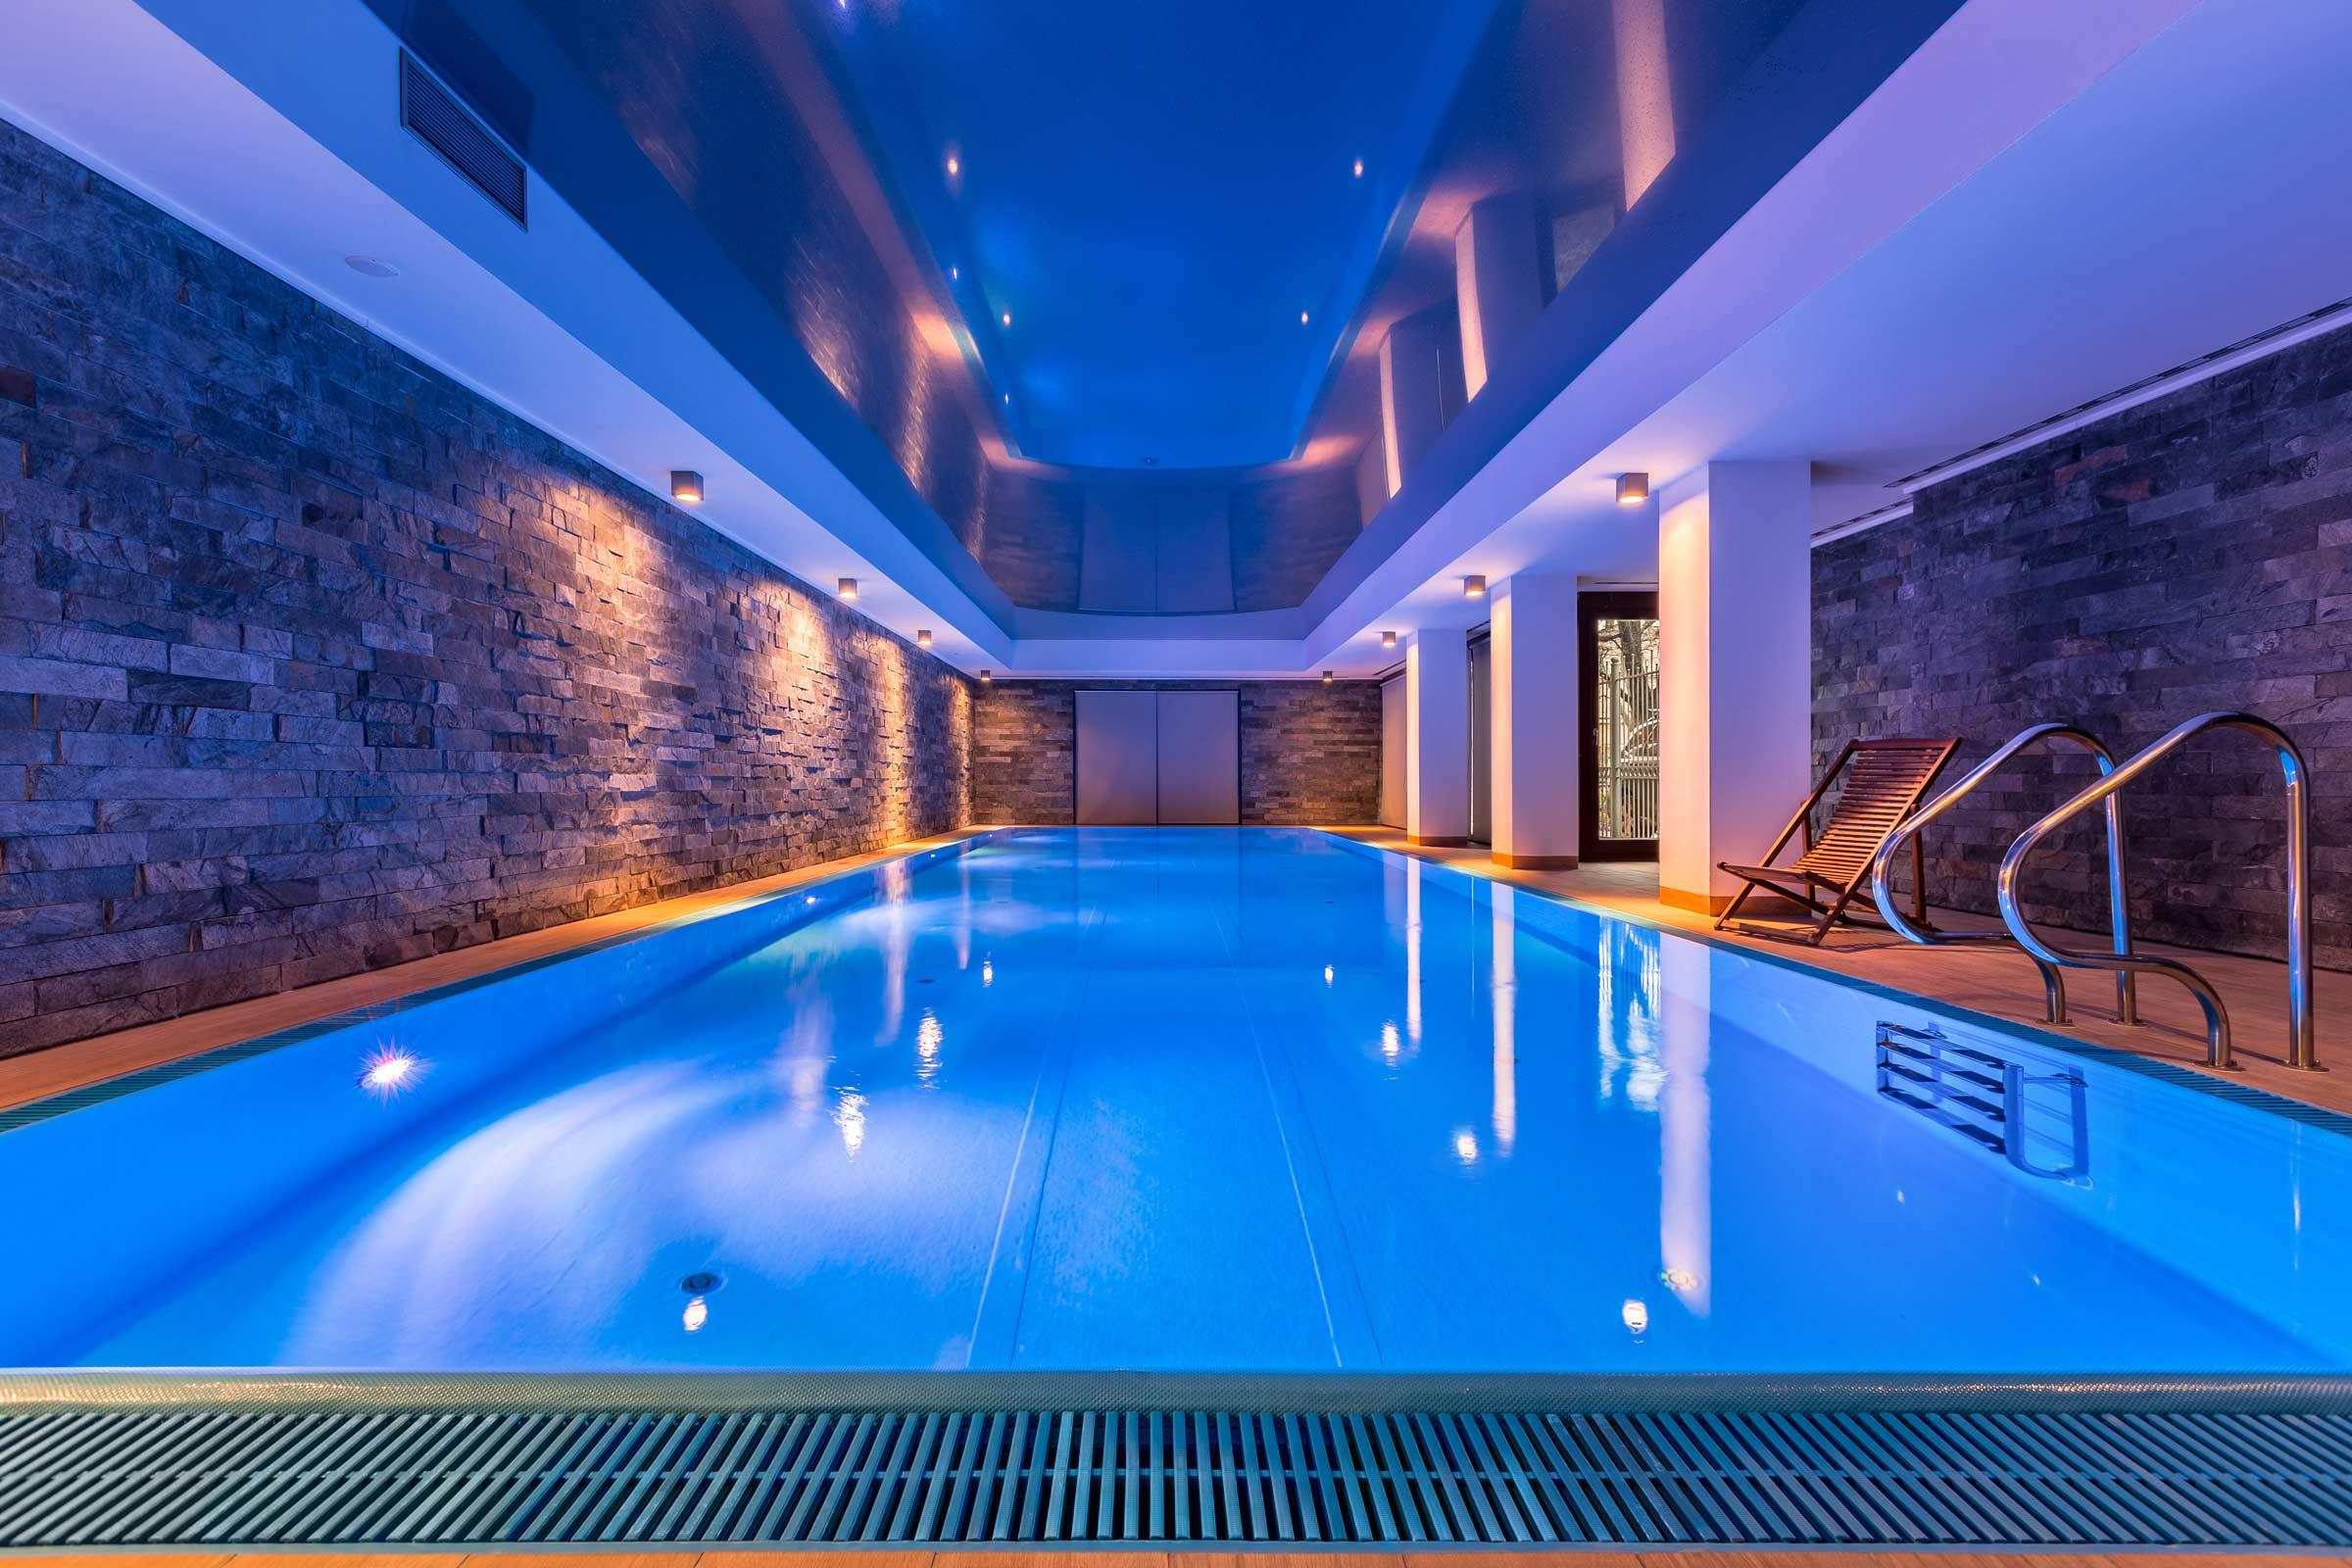 gilbert-poolman-pool-remodeling-image